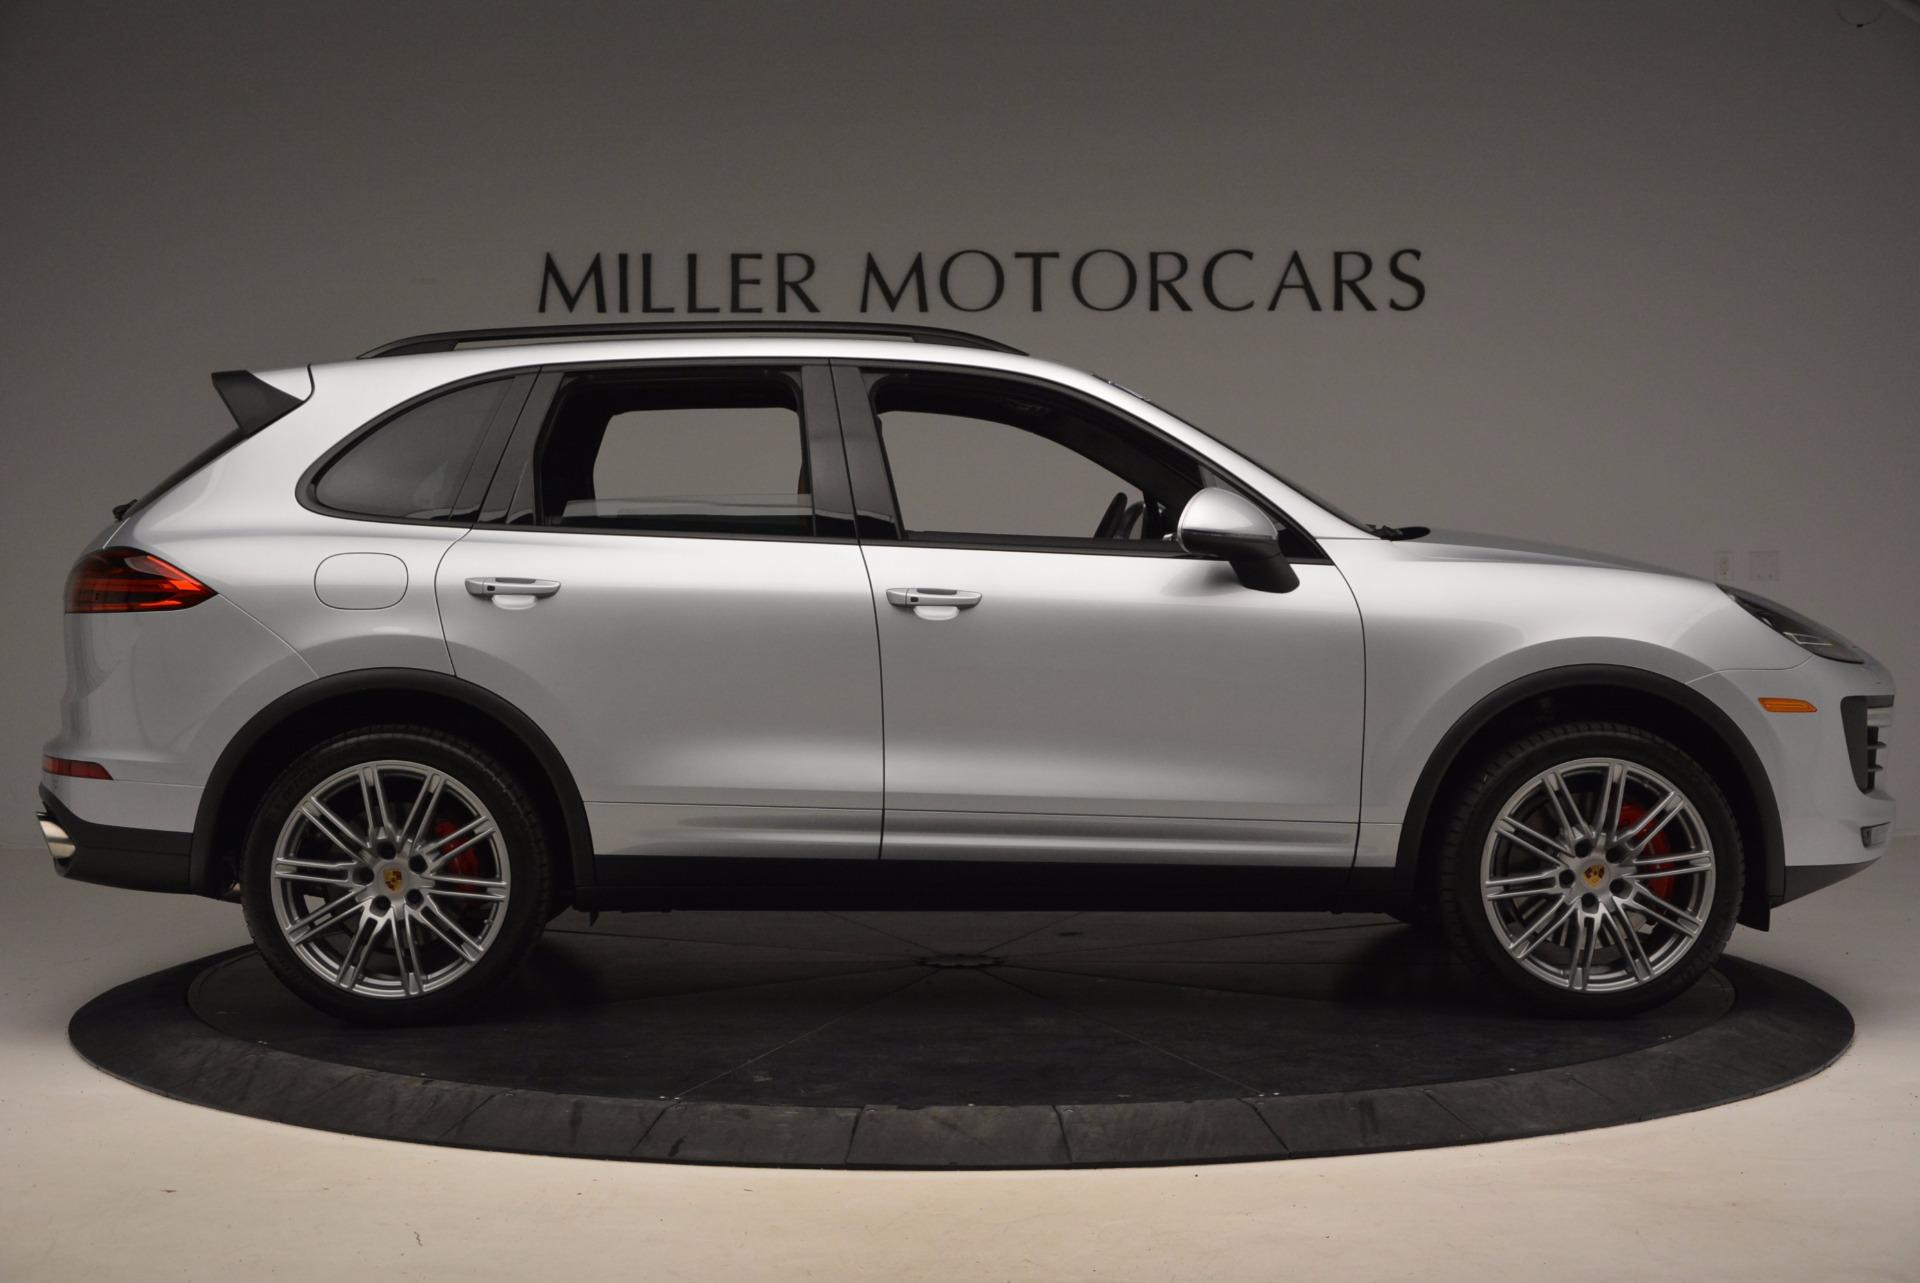 Used 2016 Porsche Cayenne Turbo For Sale In Greenwich, CT. Alfa Romeo of Greenwich, 7165 1000_p9